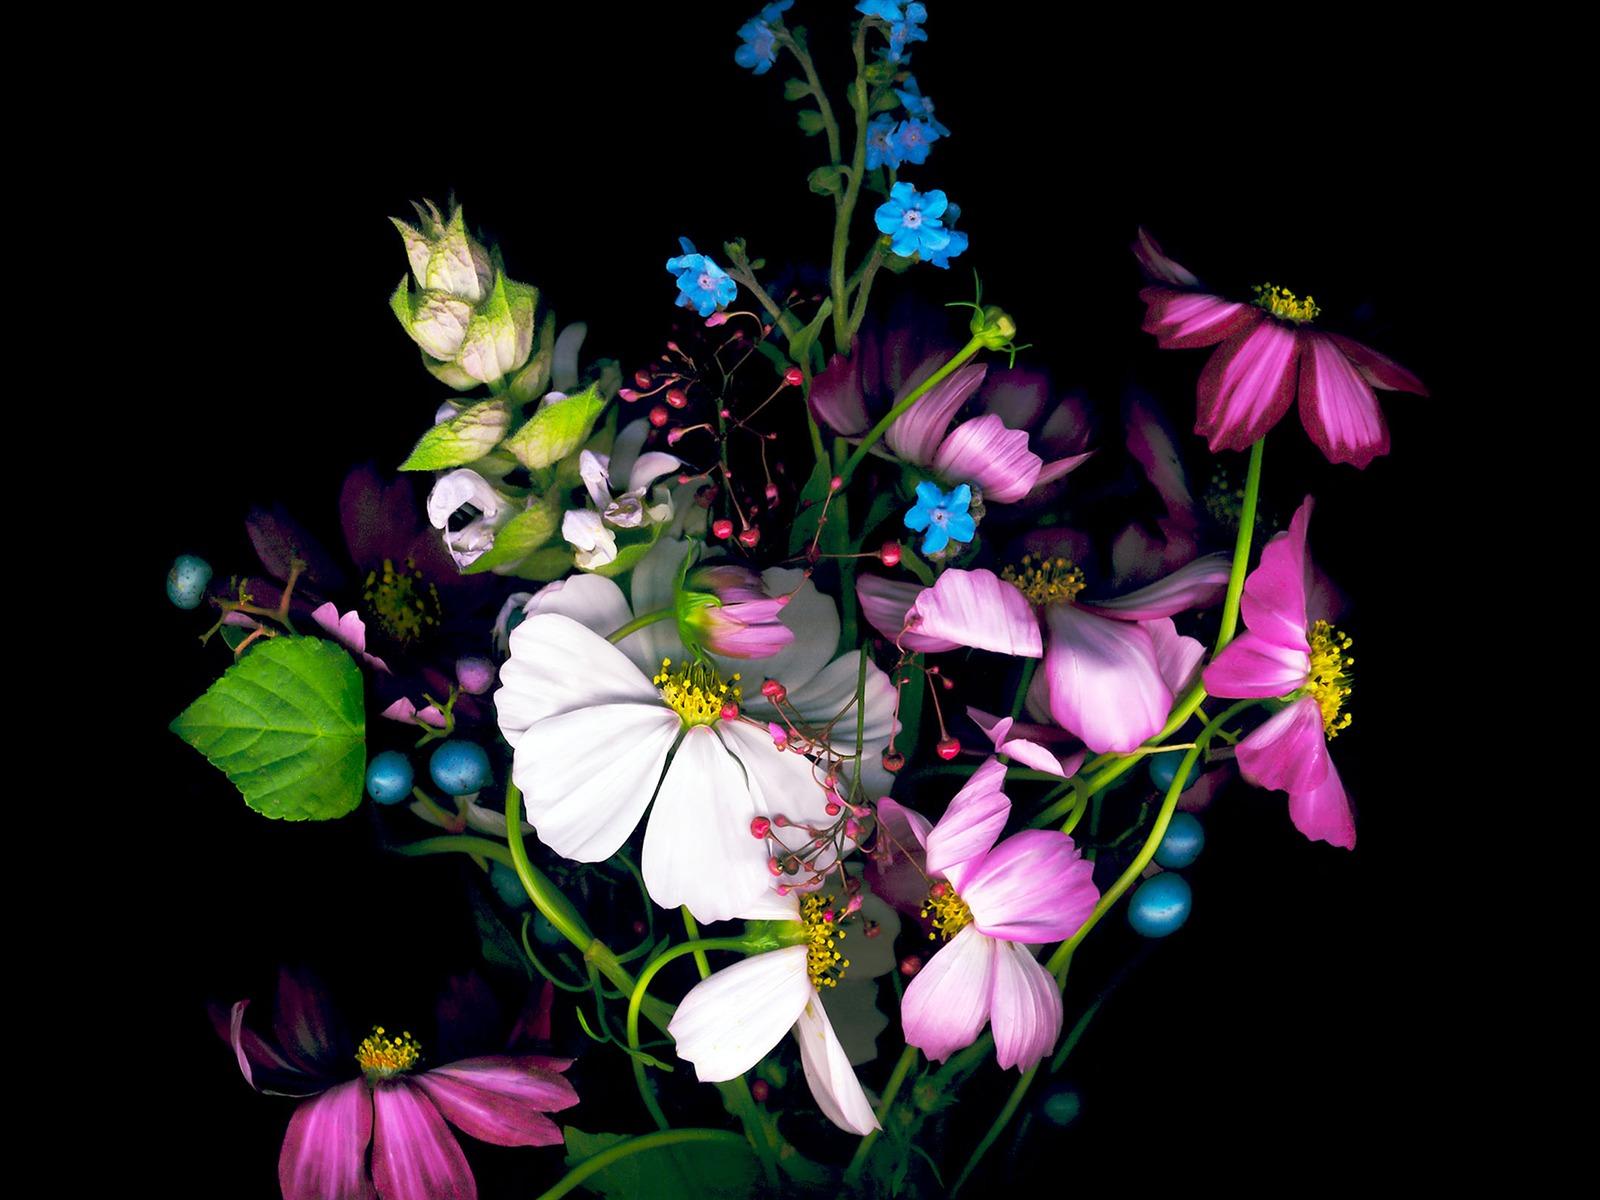 Dark Flower-Apple IOS8 IPhone6 Plus HD Wallpaper Preview